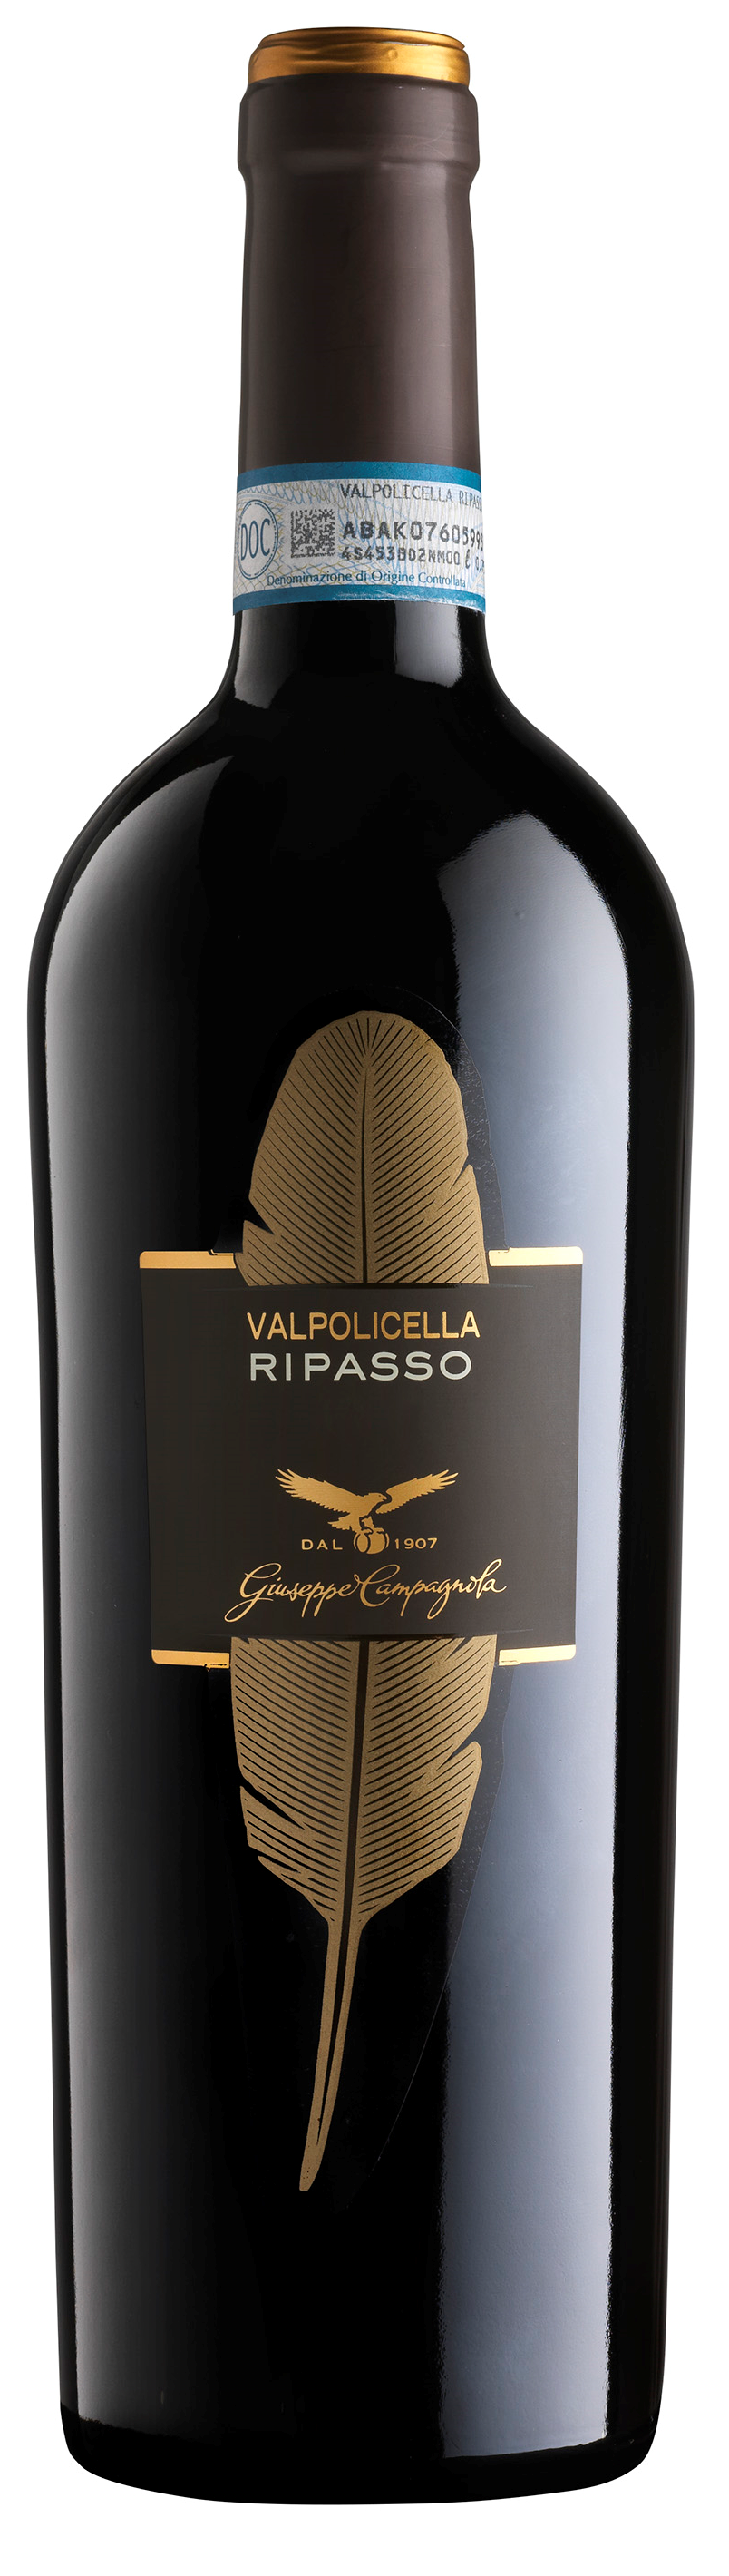 Амароне (amarone) – «горчайшее» итальянское вино